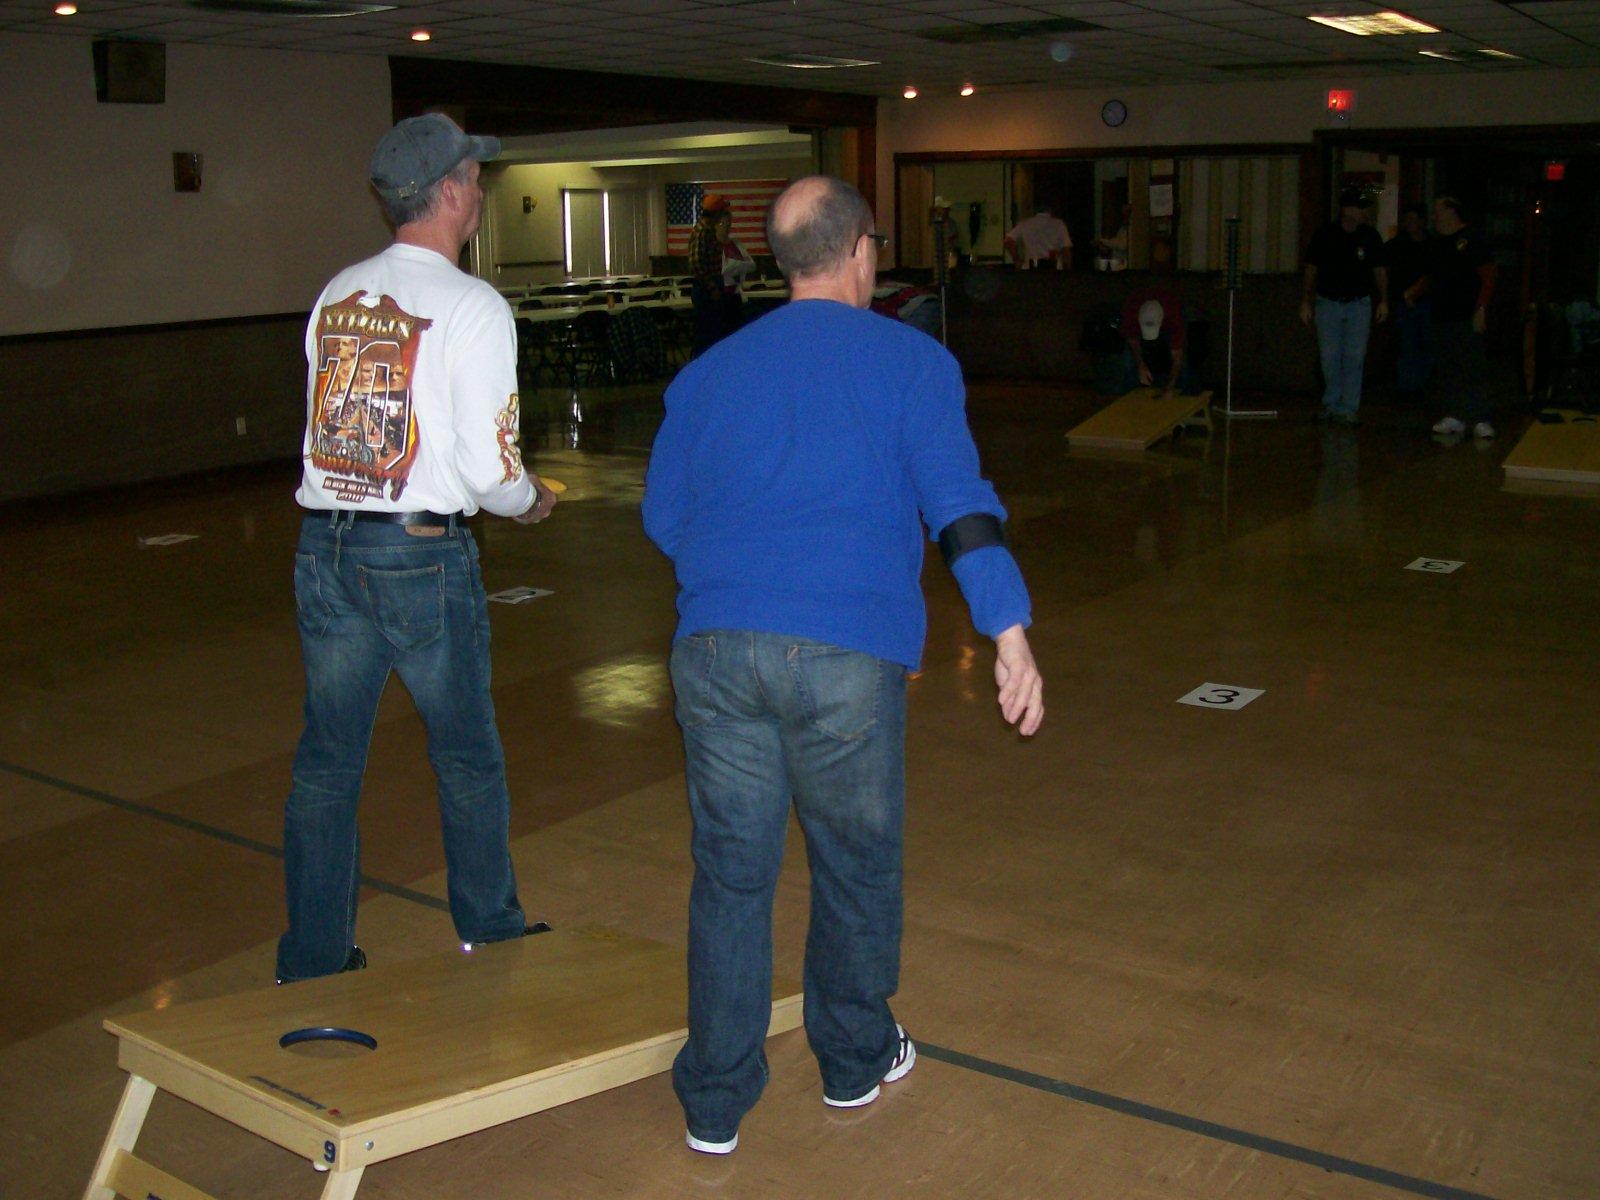 Steve Stewart and Dale Shobe  (Jan. 15, 2011)